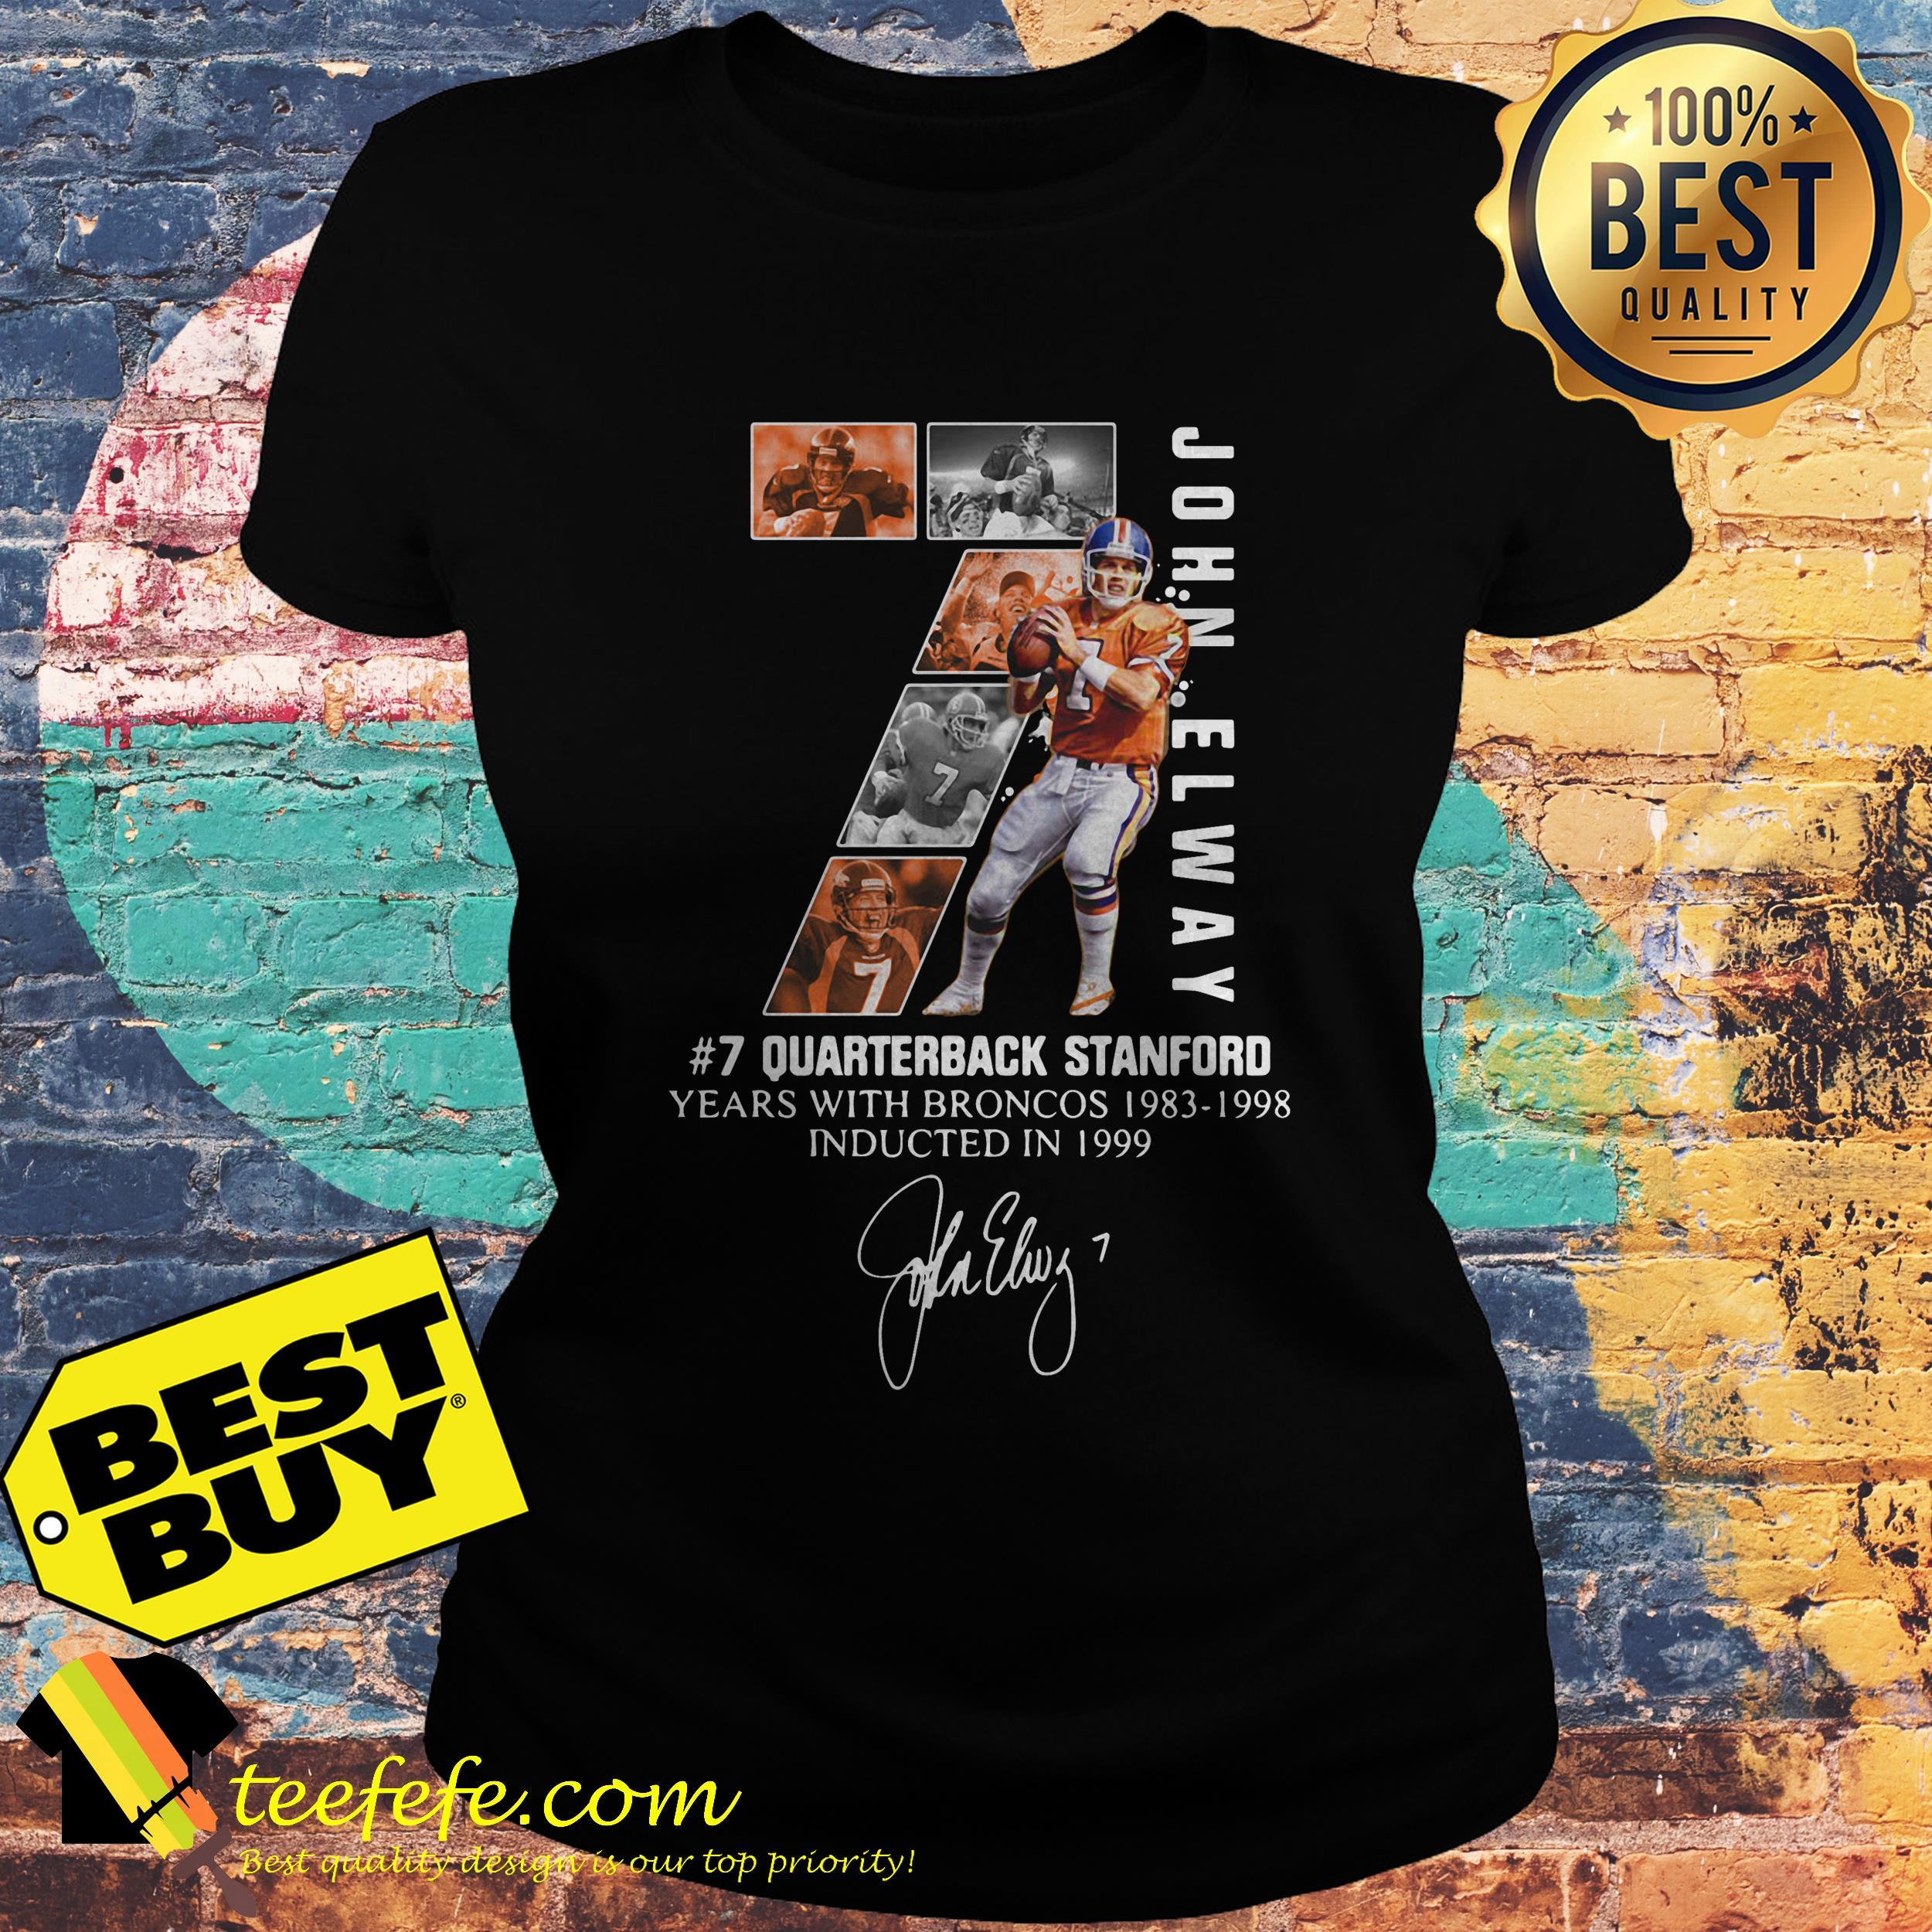 sale retailer 4e92d ada5c John Elway 7 quarterback stanford years with Broncos 1983-1998 signature  shirt